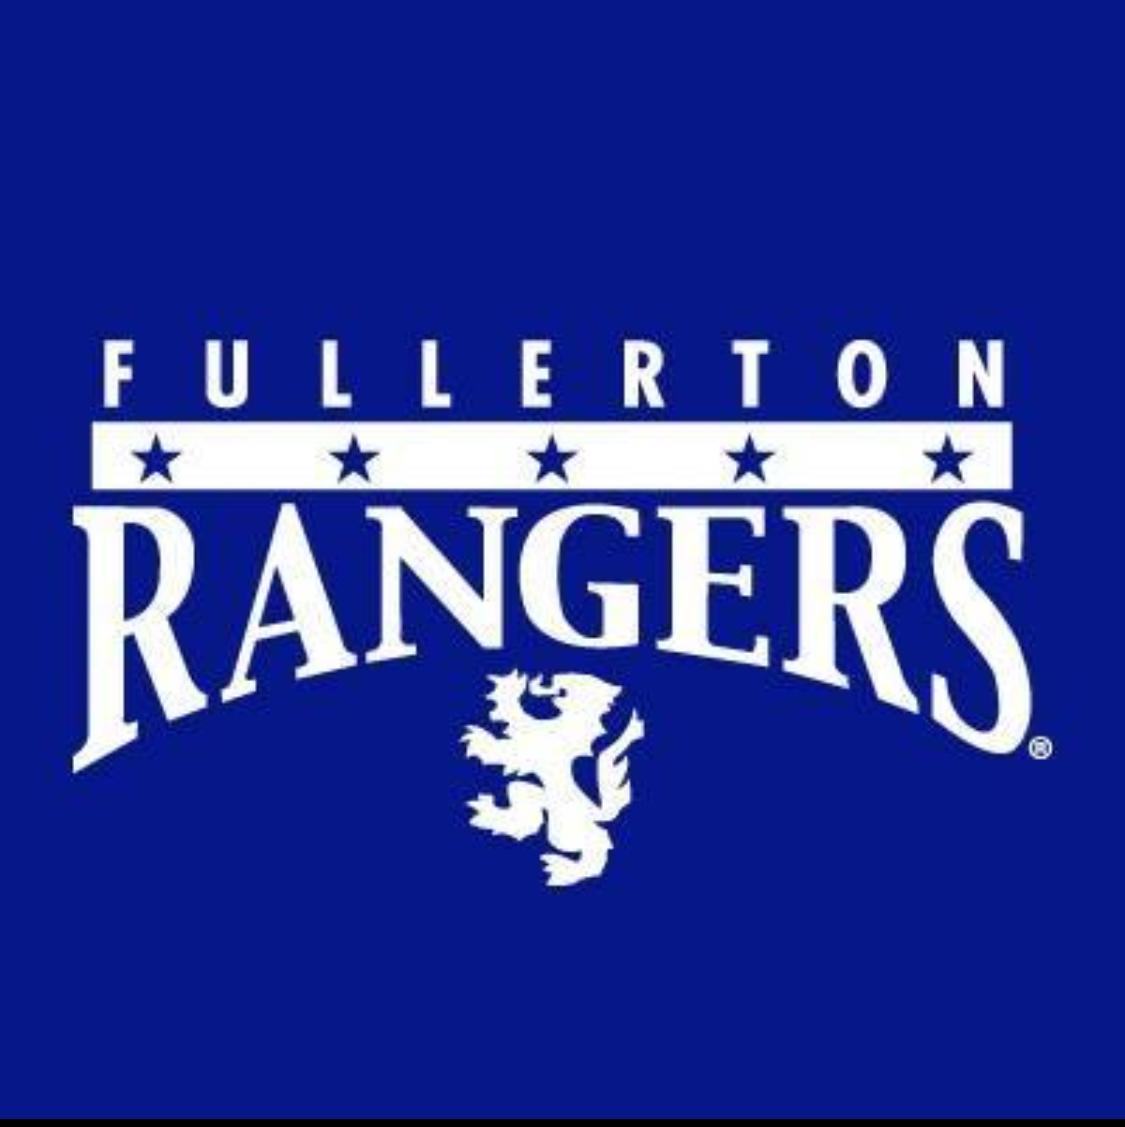 Fullerton Rangers SYL 02